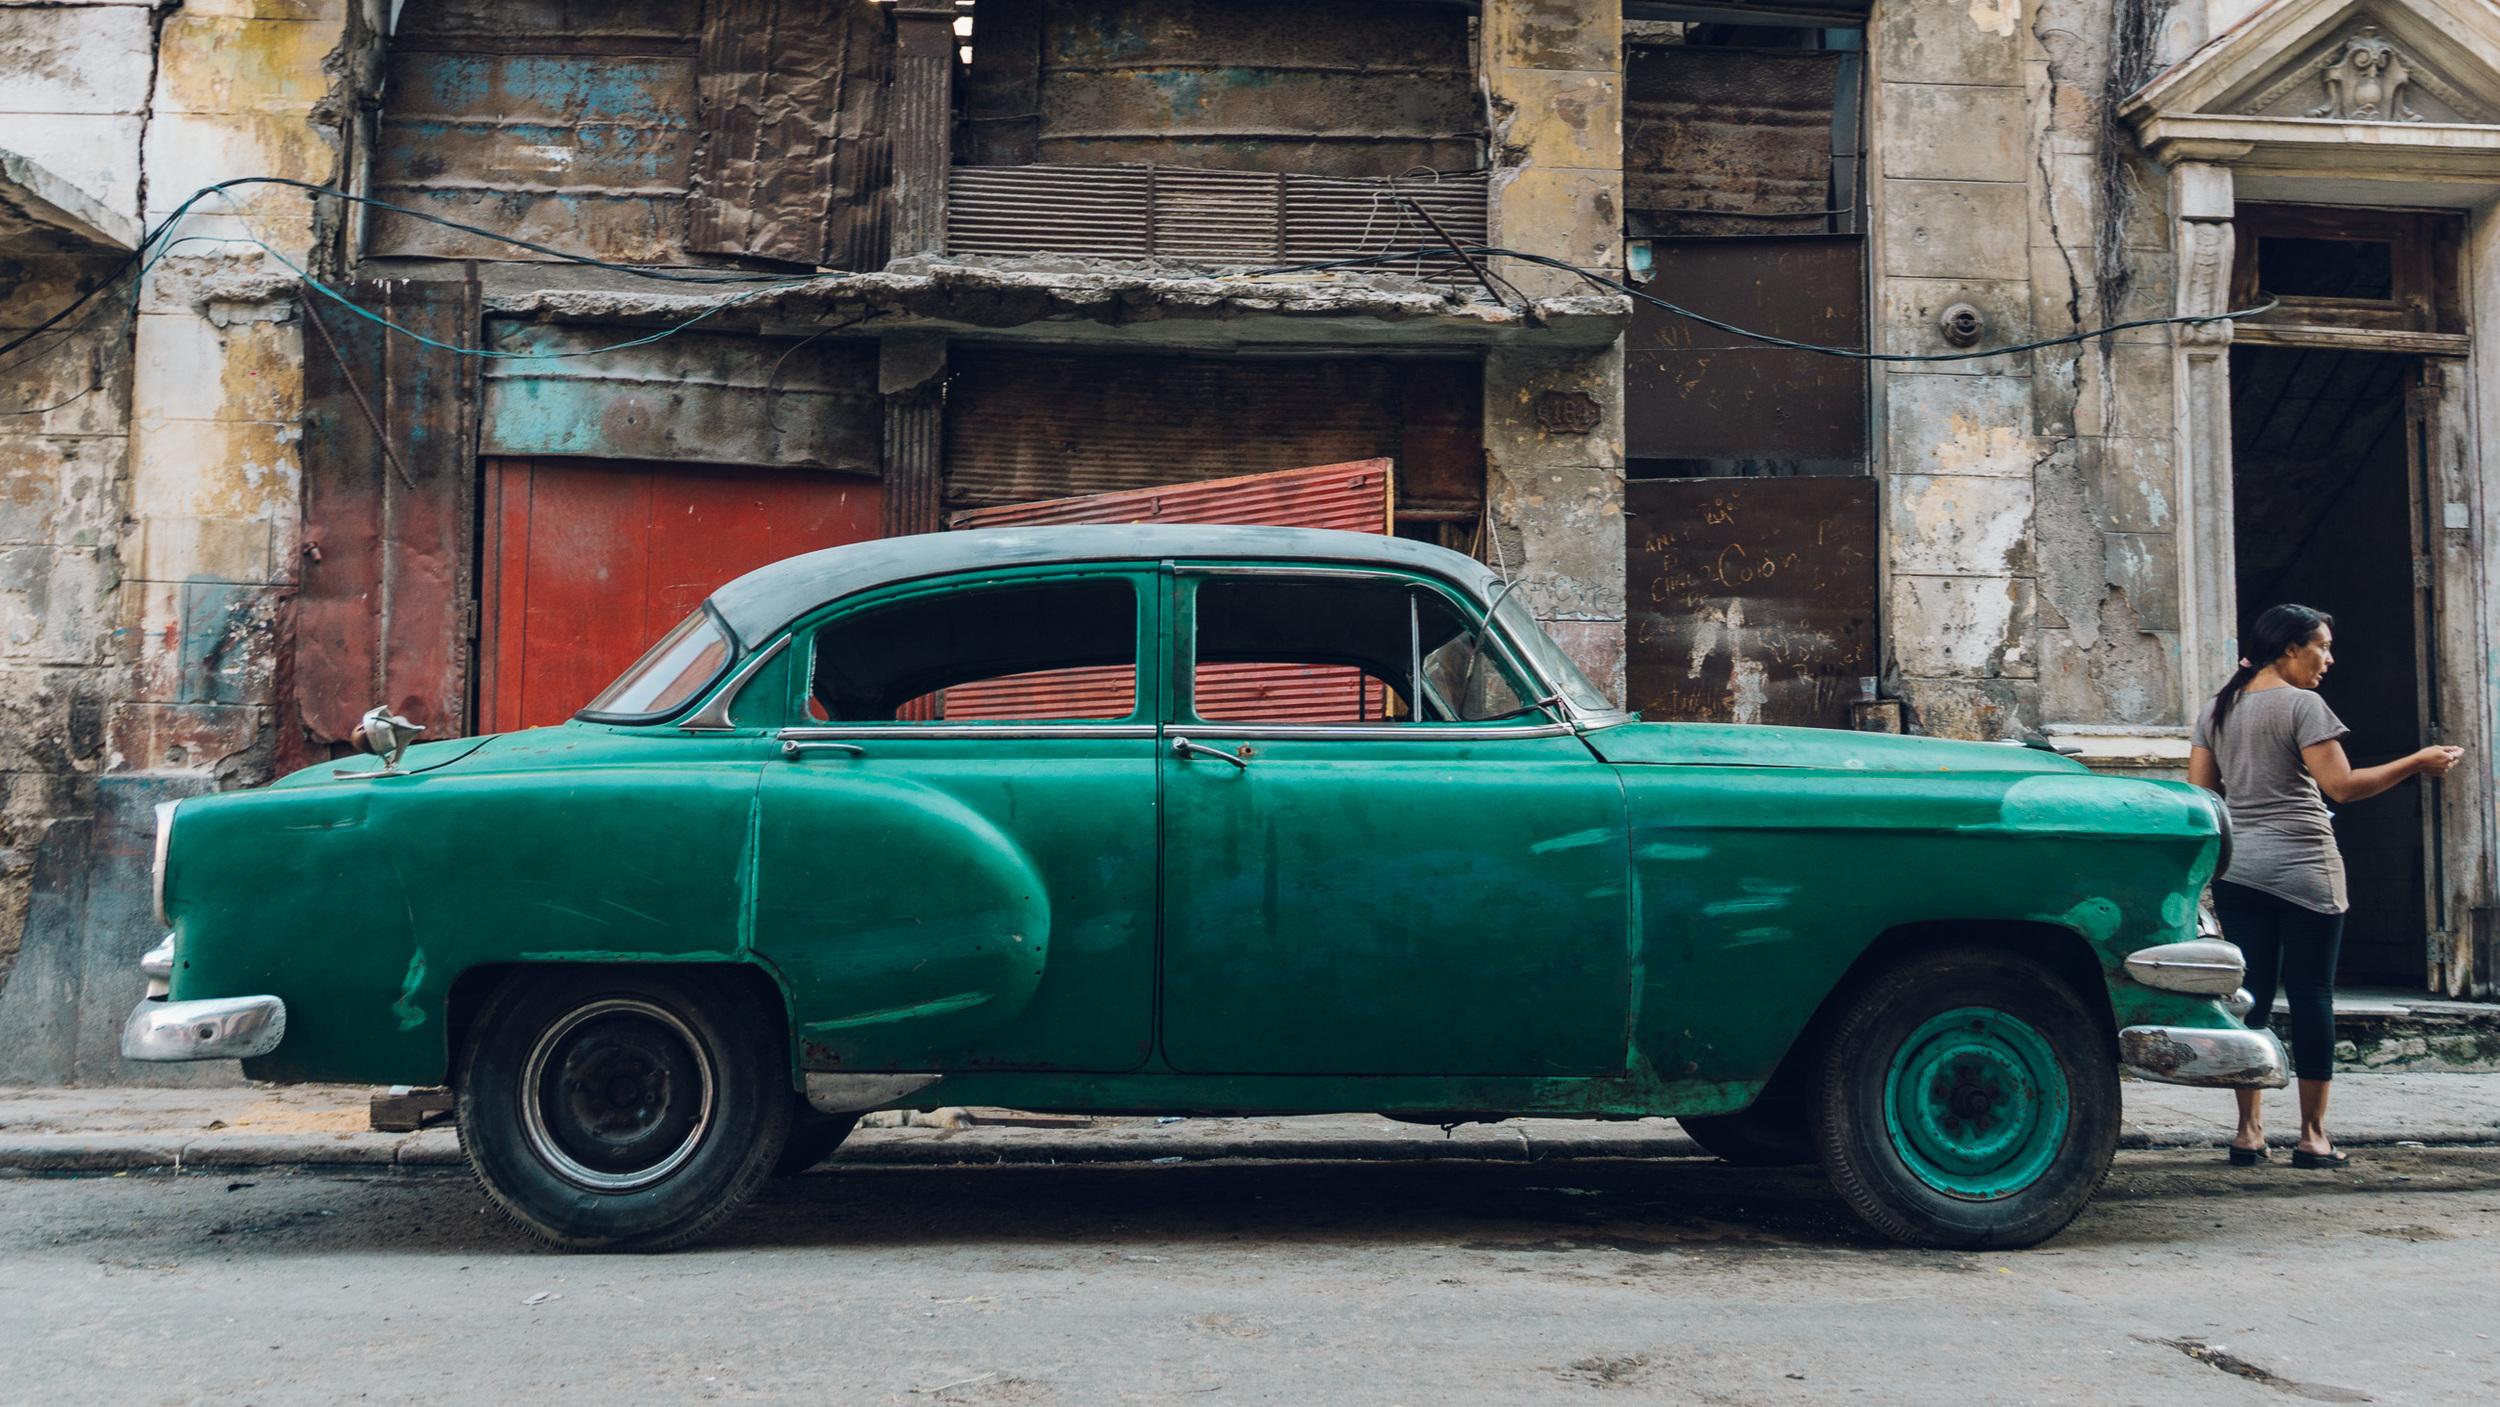 DeClaro-Photography-Cuba-02780.jpg